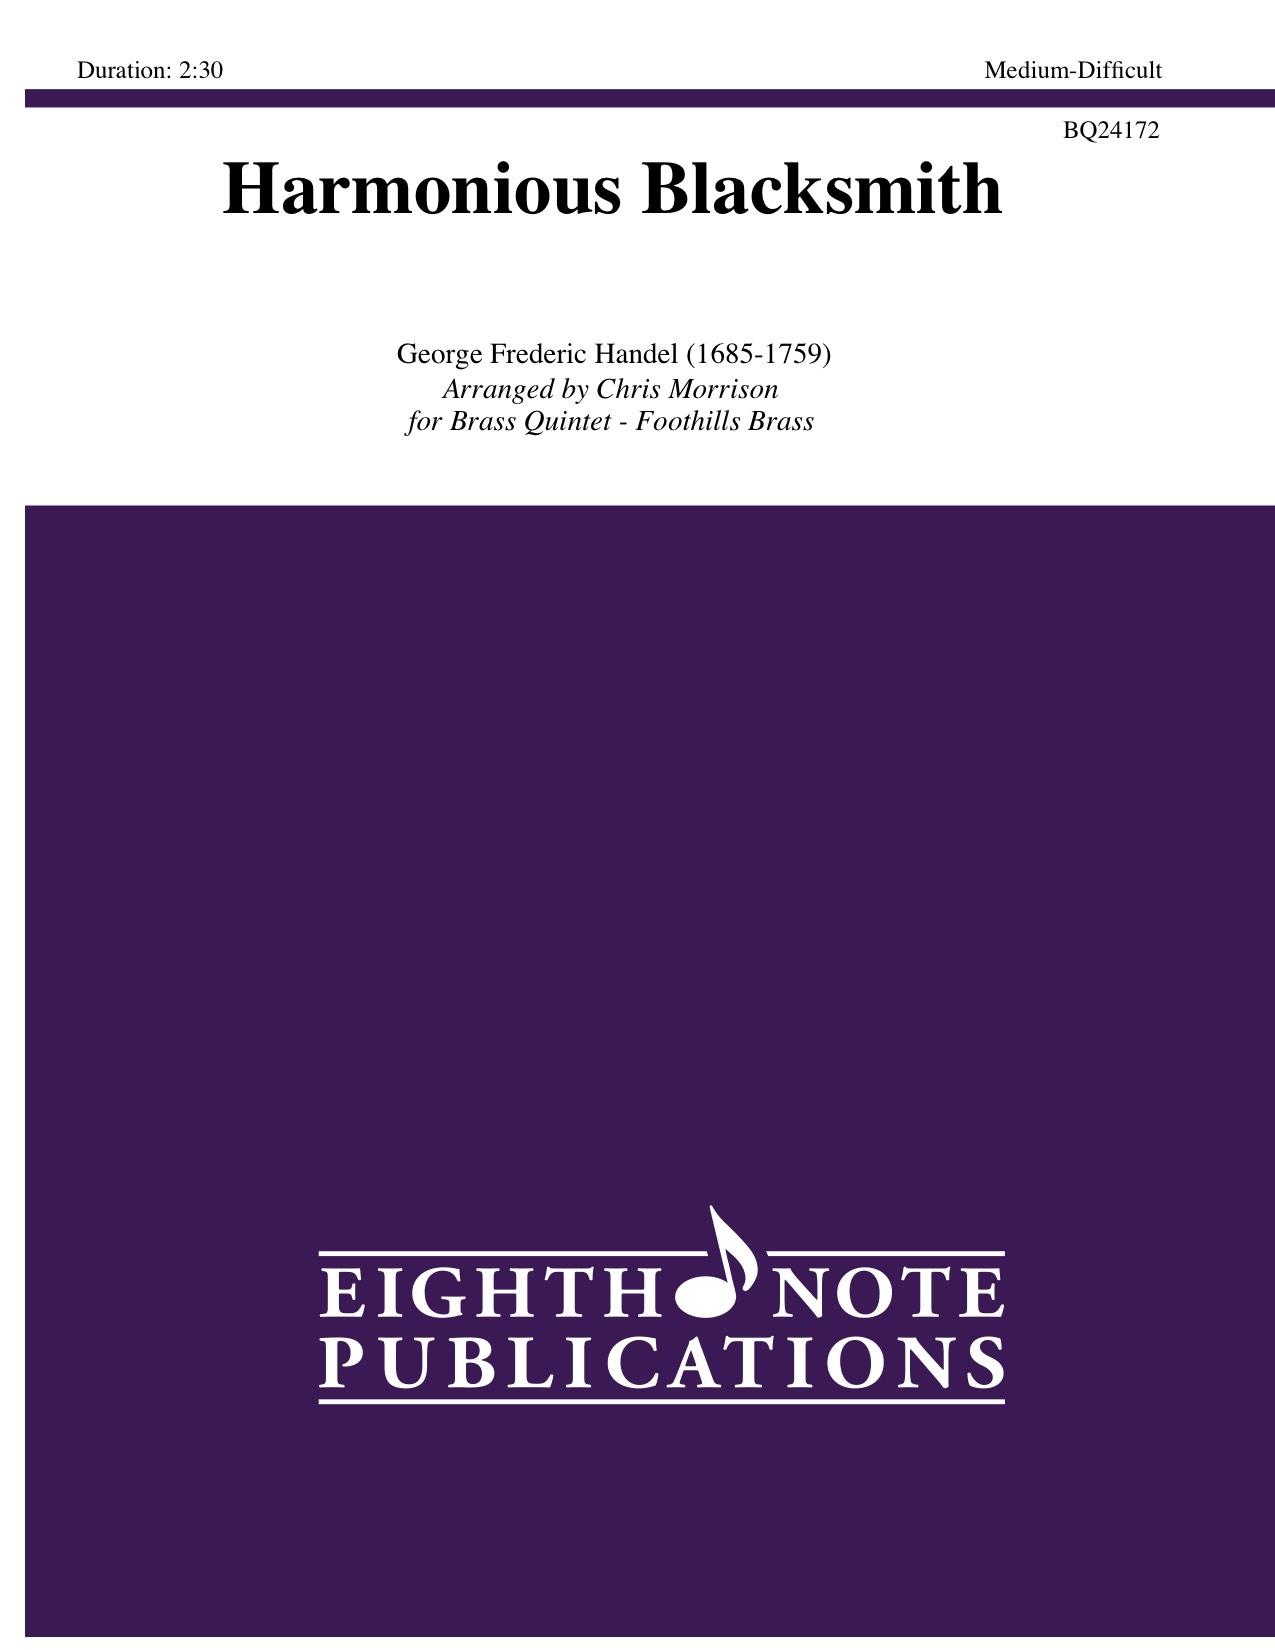 Harmonious Blacksmith - George Frederic Handel